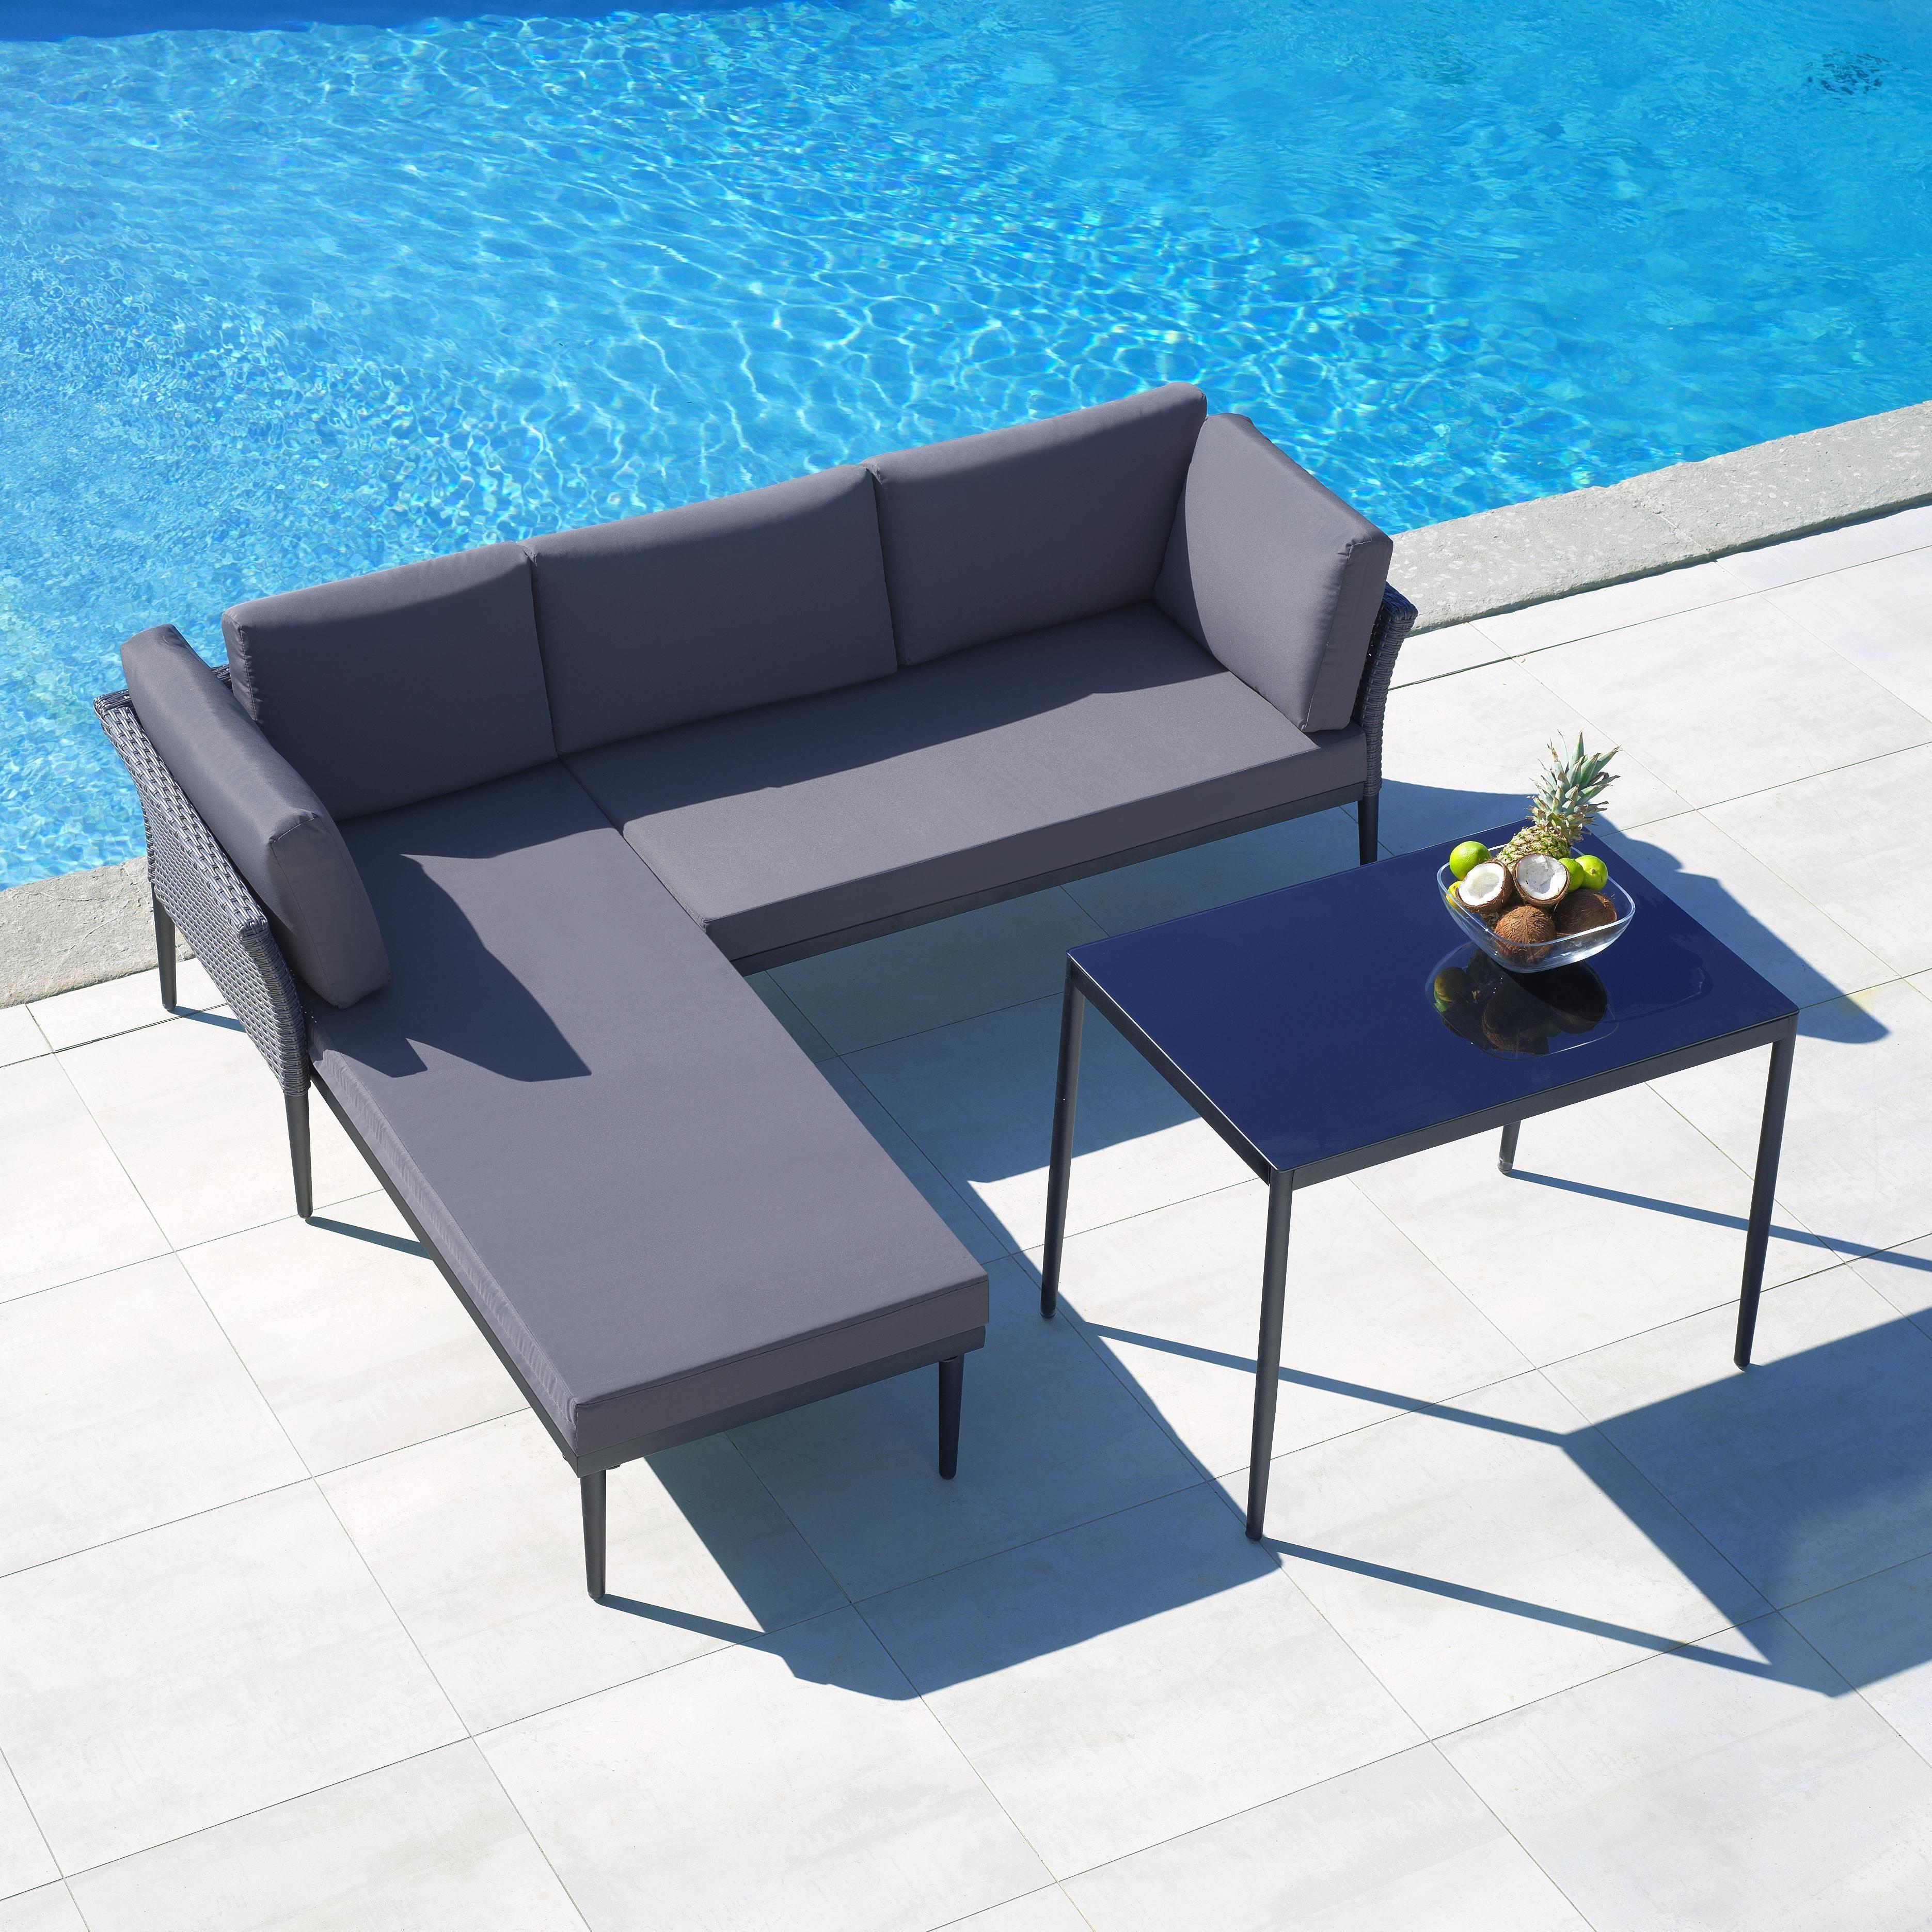 Loungegarnitur Madlen 9-teilig - Dunkelgrau/Grau, MODERN, Glas/Kunststoff (215/175cm) - Modern Living